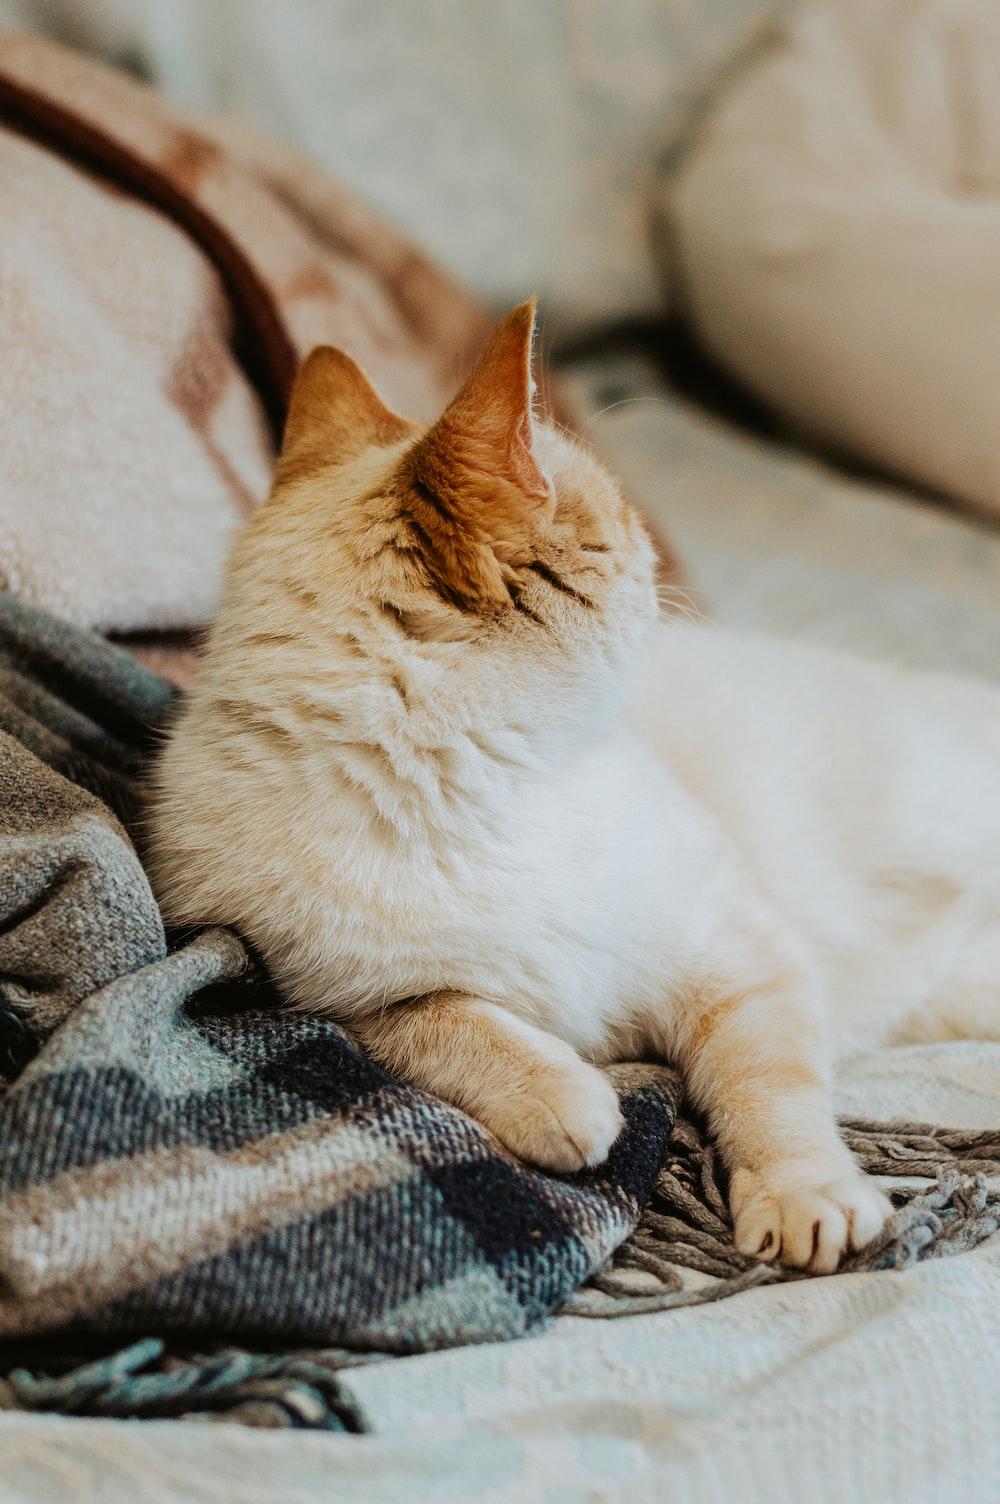 selective focus photography of orange cat